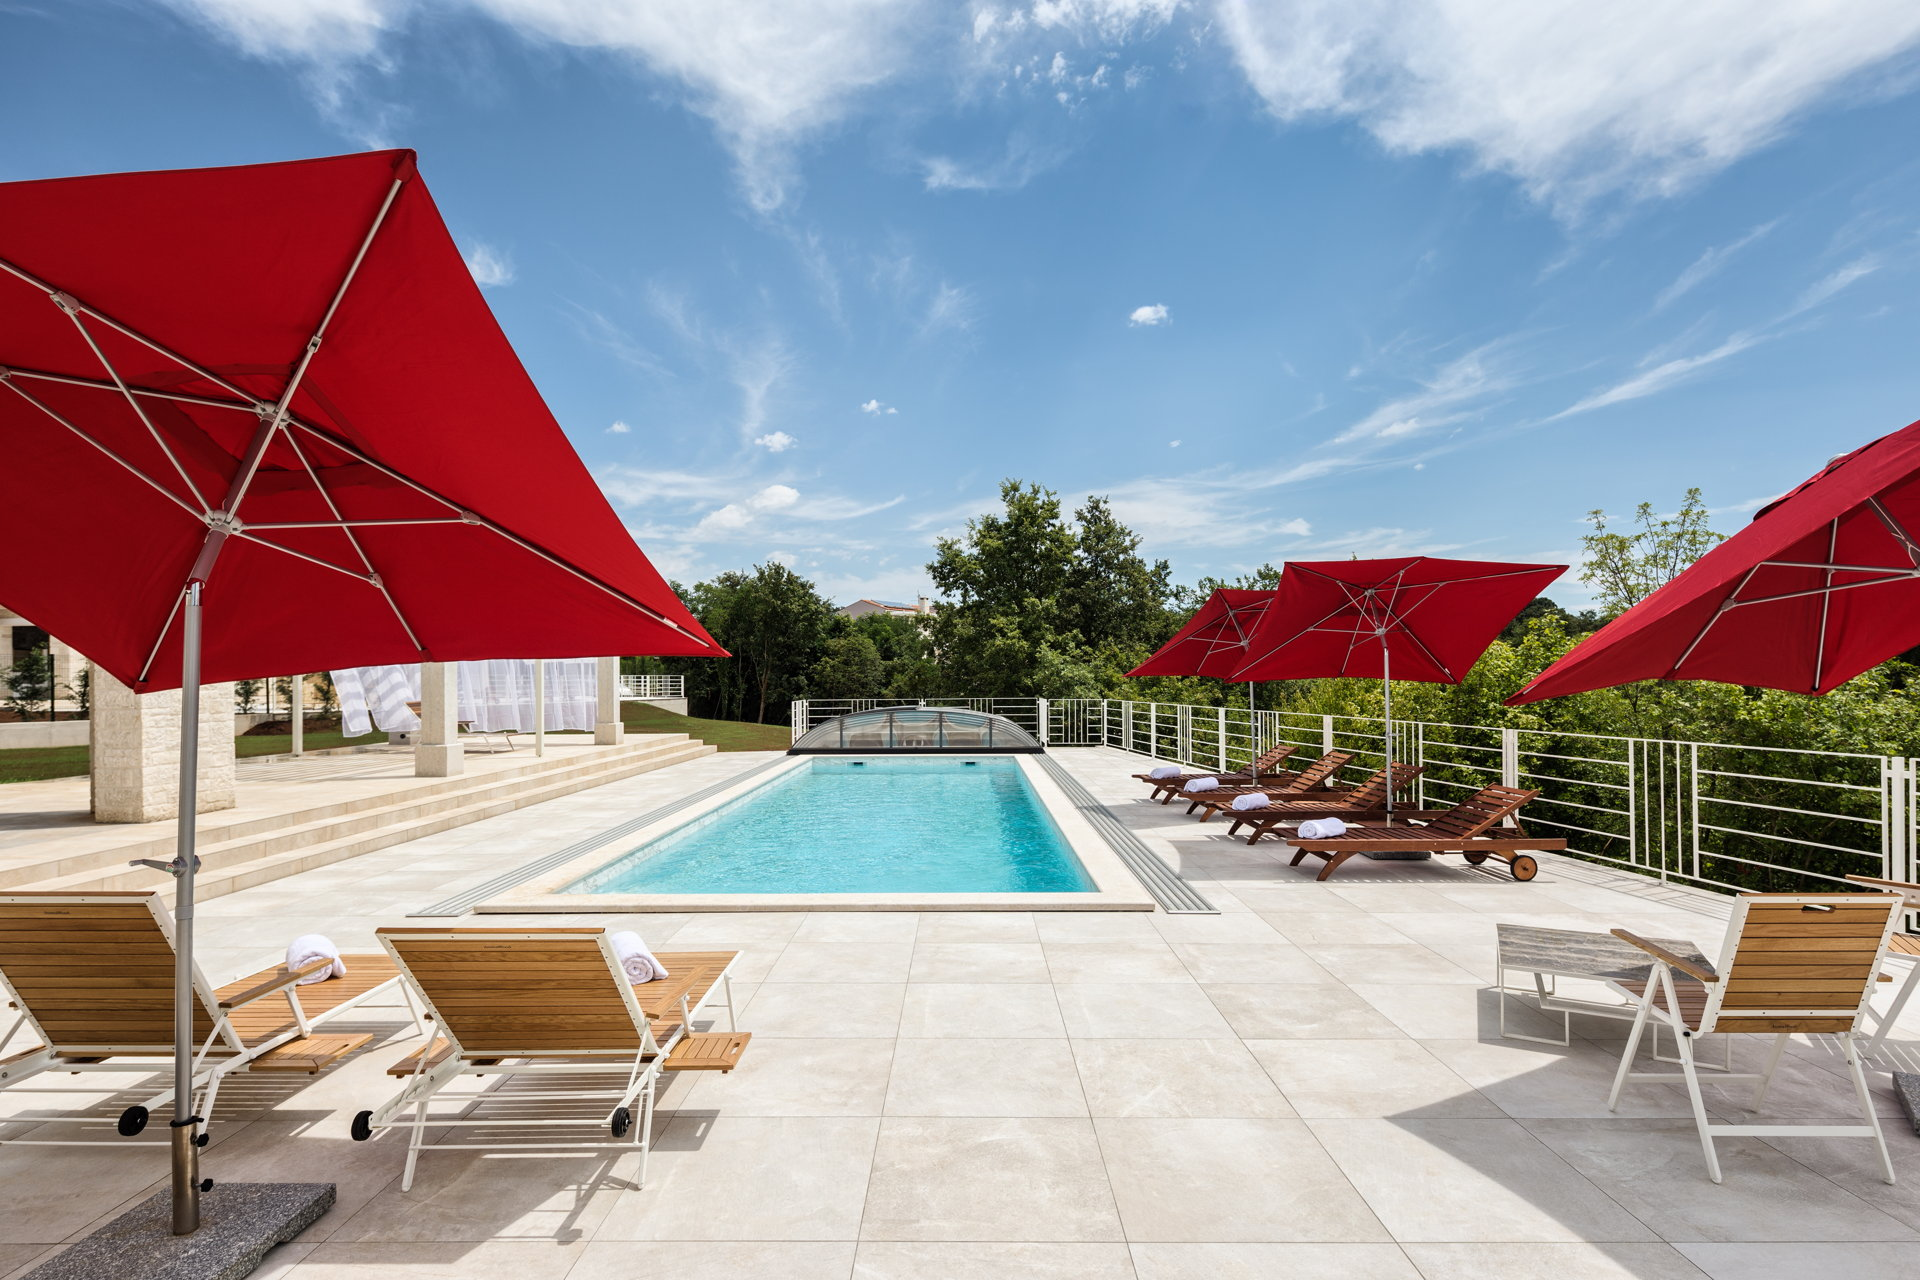 Villa Energy Gold with Pool - wonderful pool area